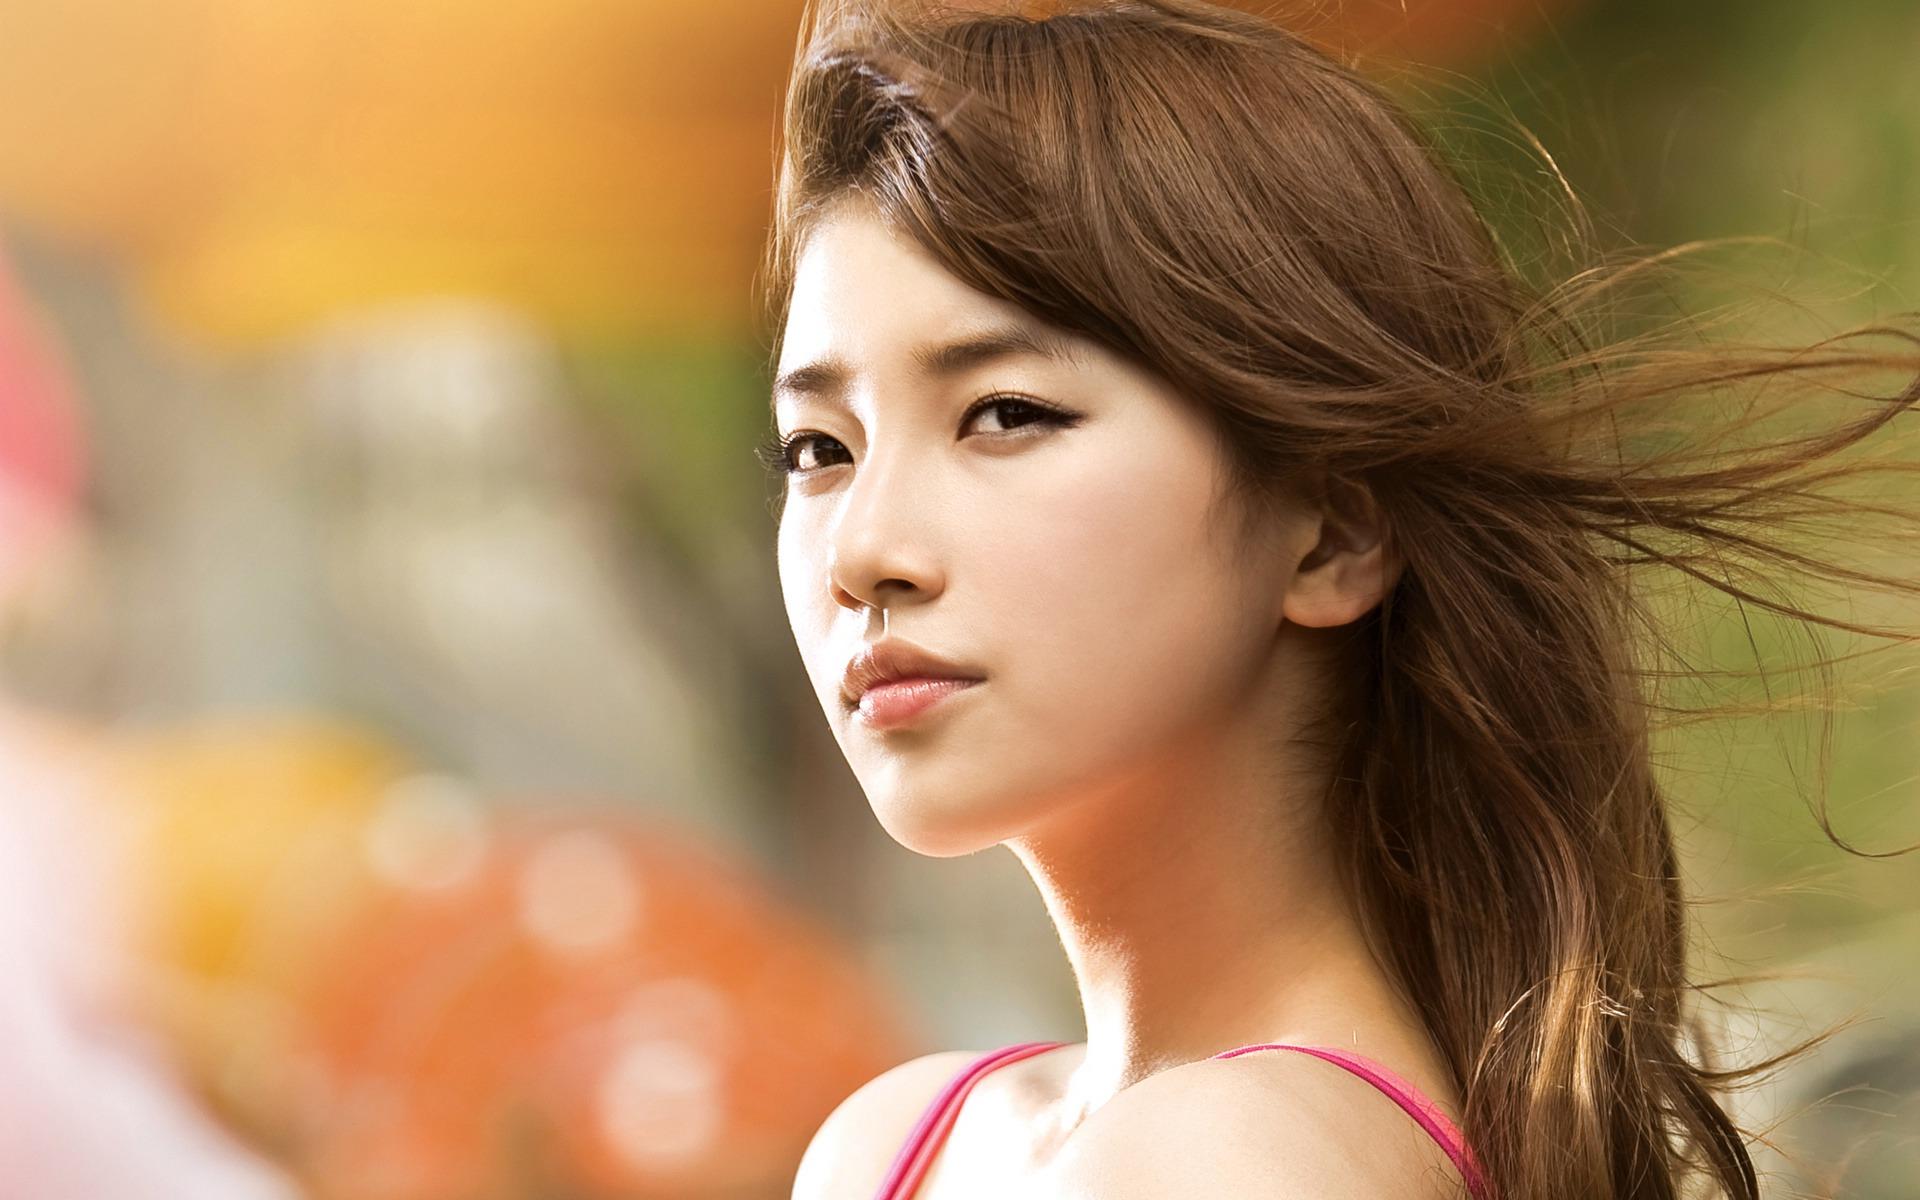 Suzy Korean girls photo HD wallpaper 02 Preview